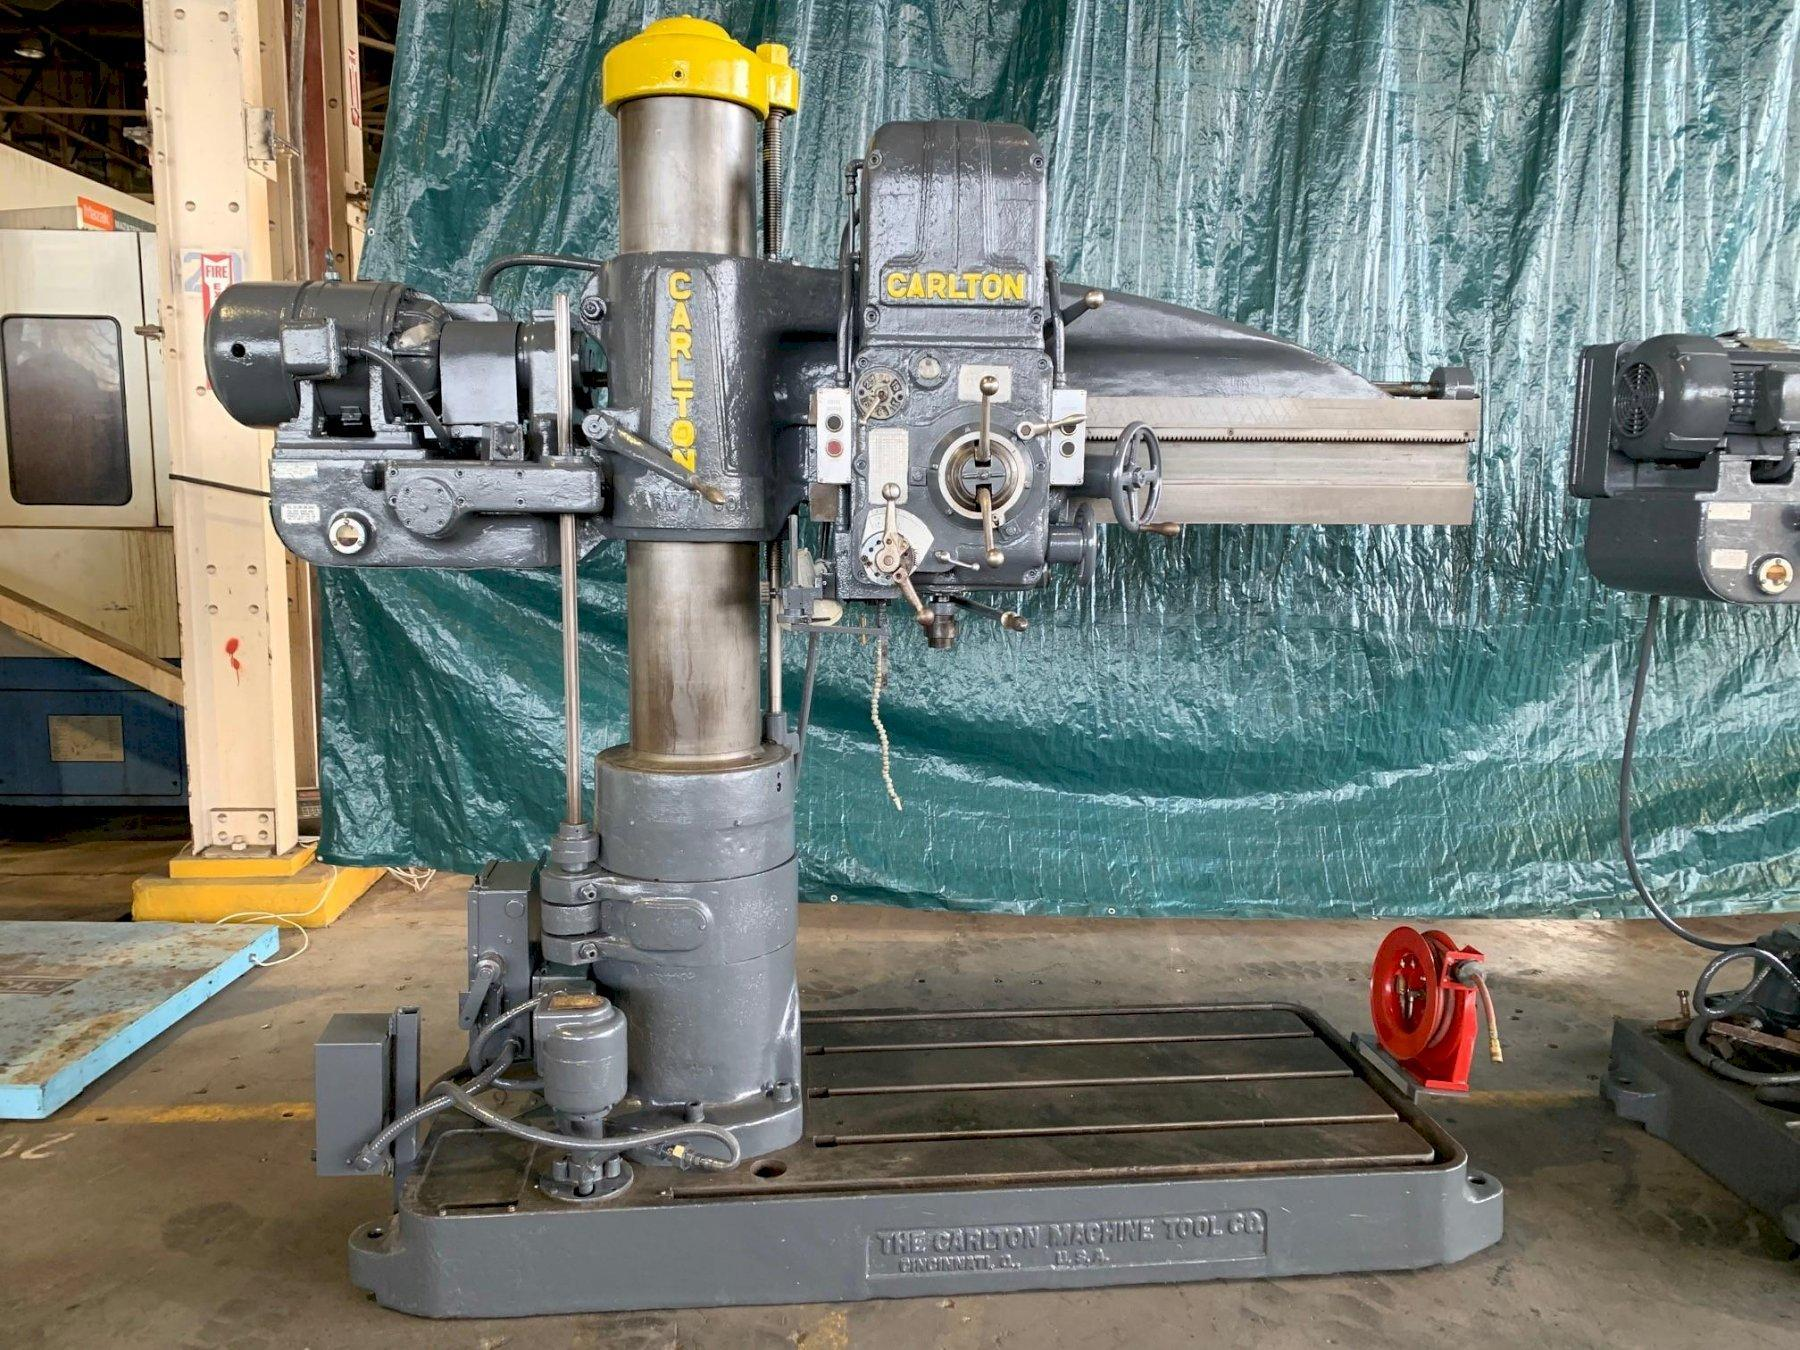 "4' X 11"" CARLTON MODEL #1A 2000 RPM RADIAL ARM DRILL: STOCK #10998"